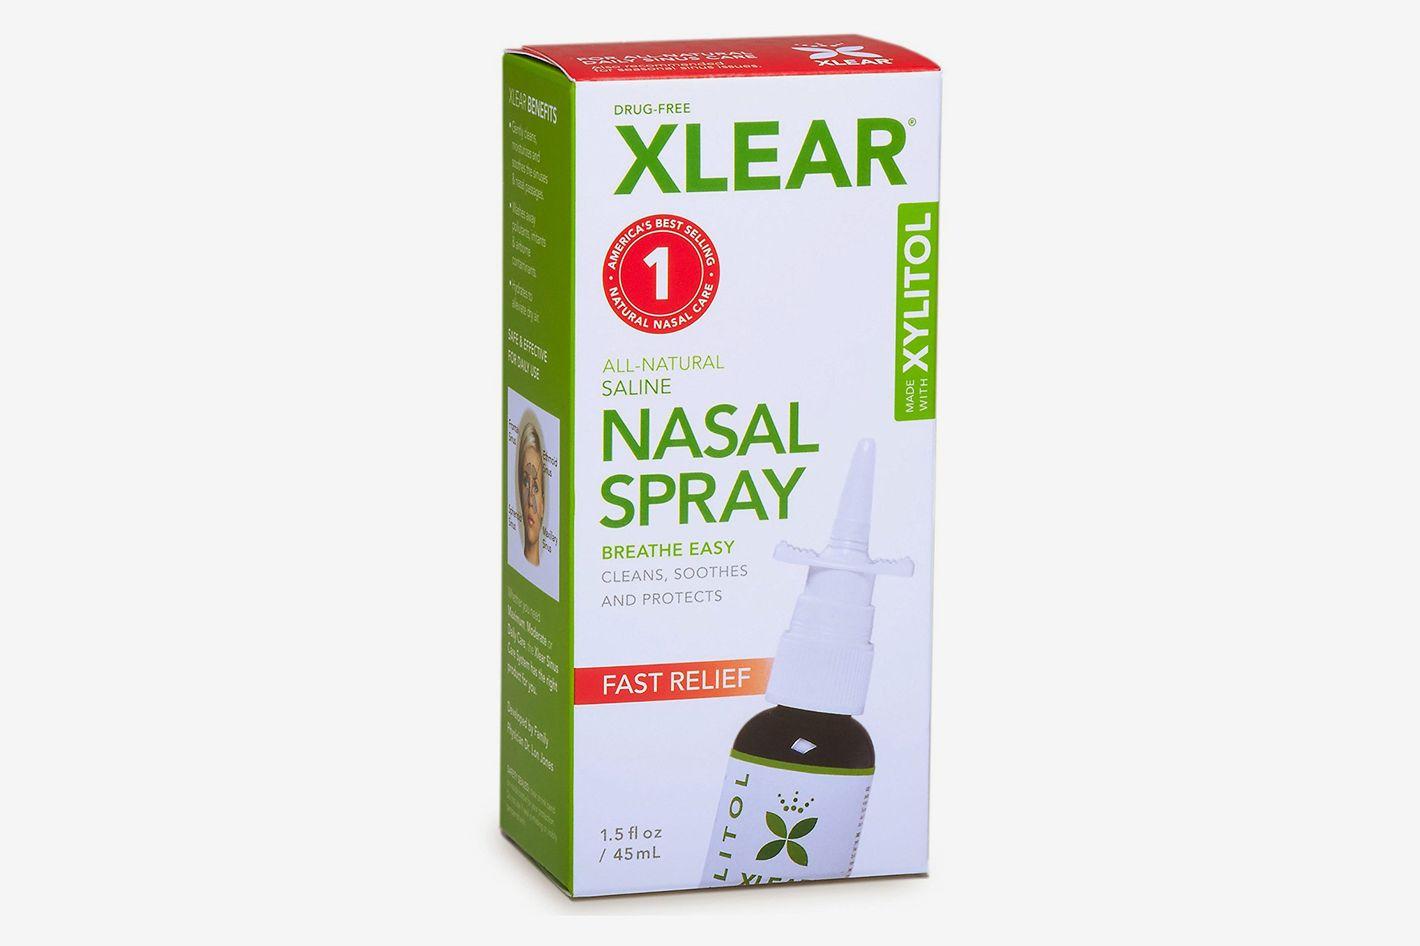 Xlear Natural Saline Nasal Spray